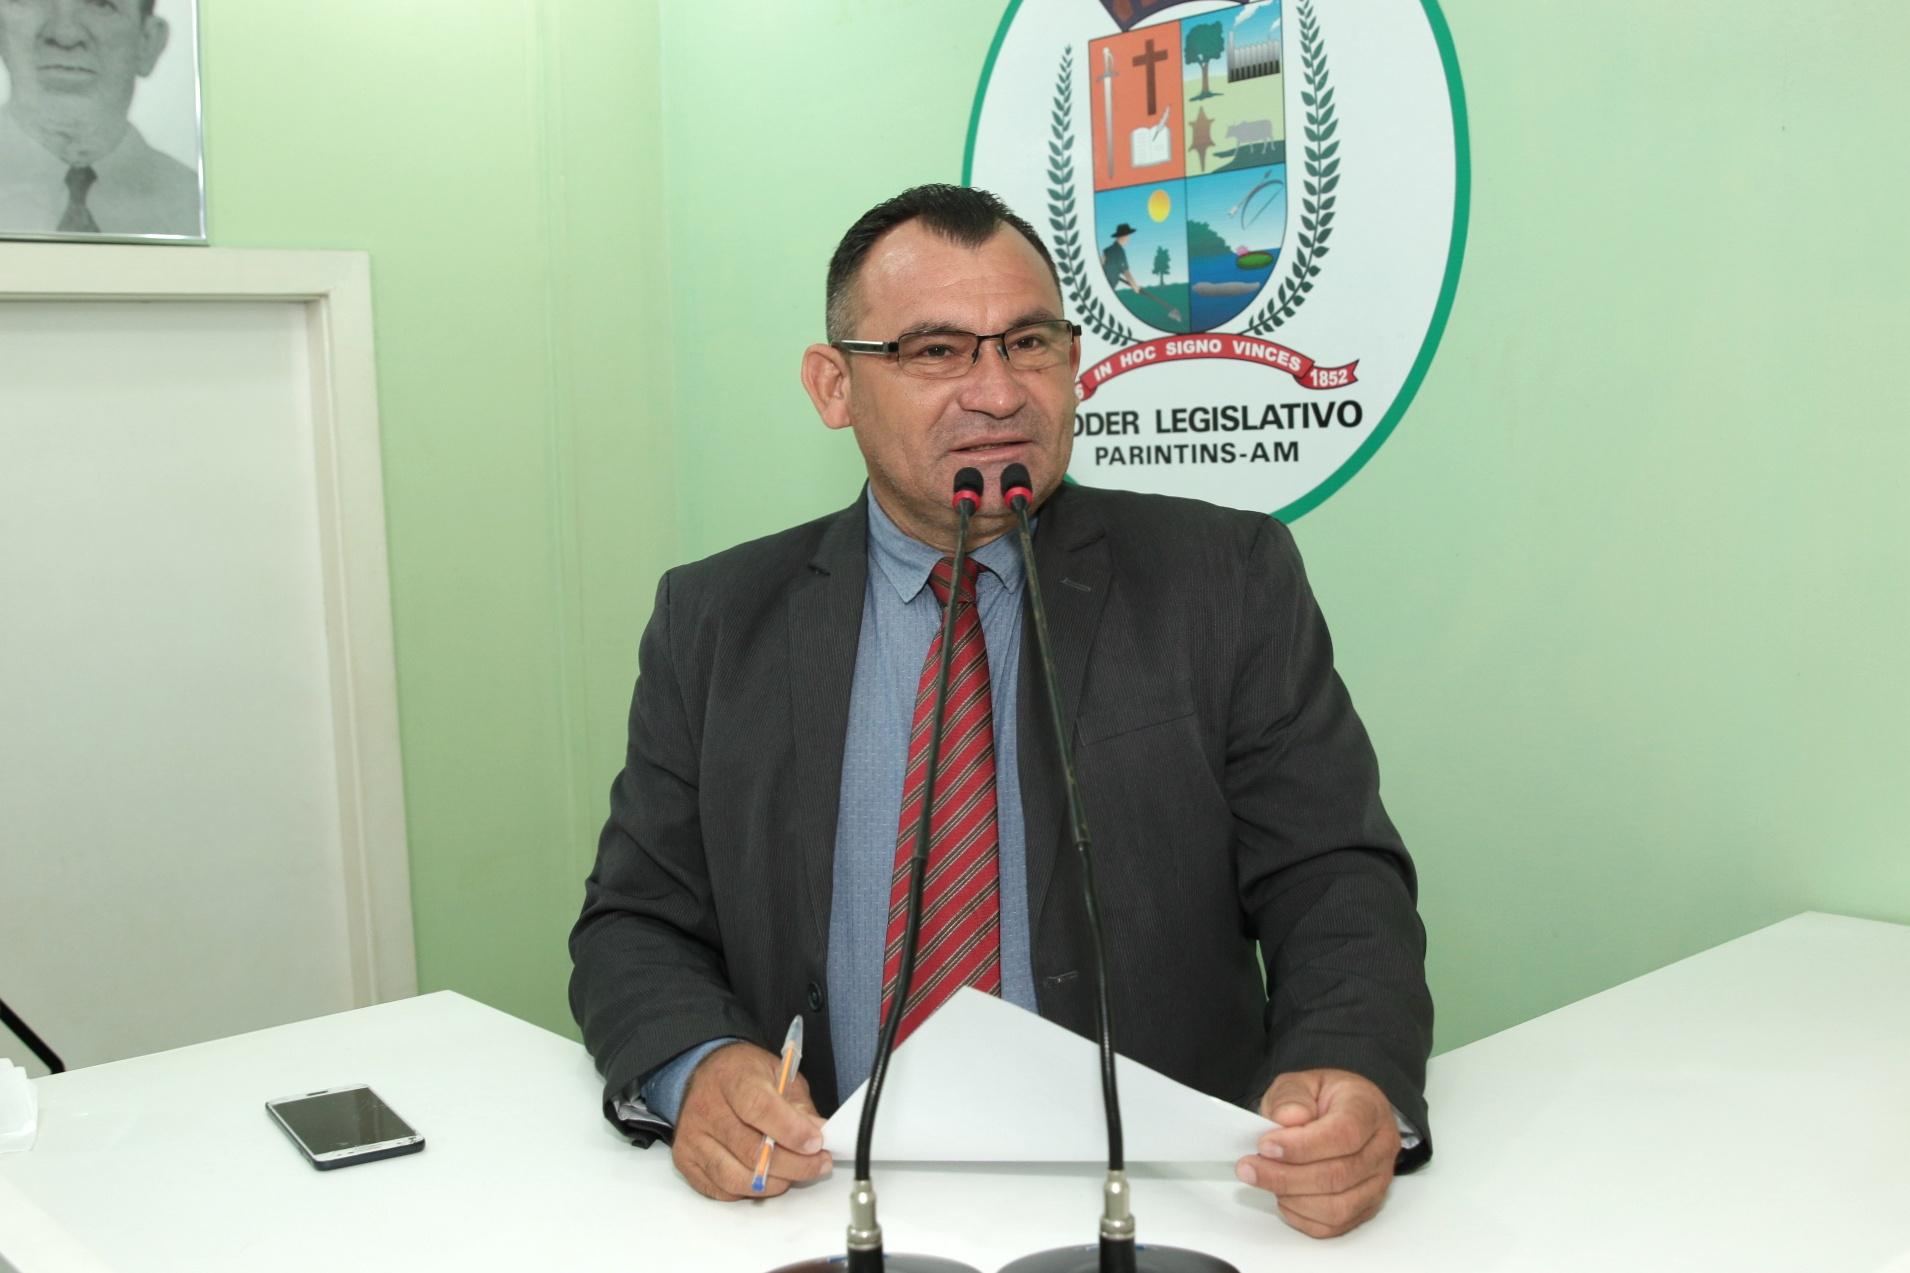 Vereador Afonso Caburi trata sobre Esporte e Saúde no município de Parintins